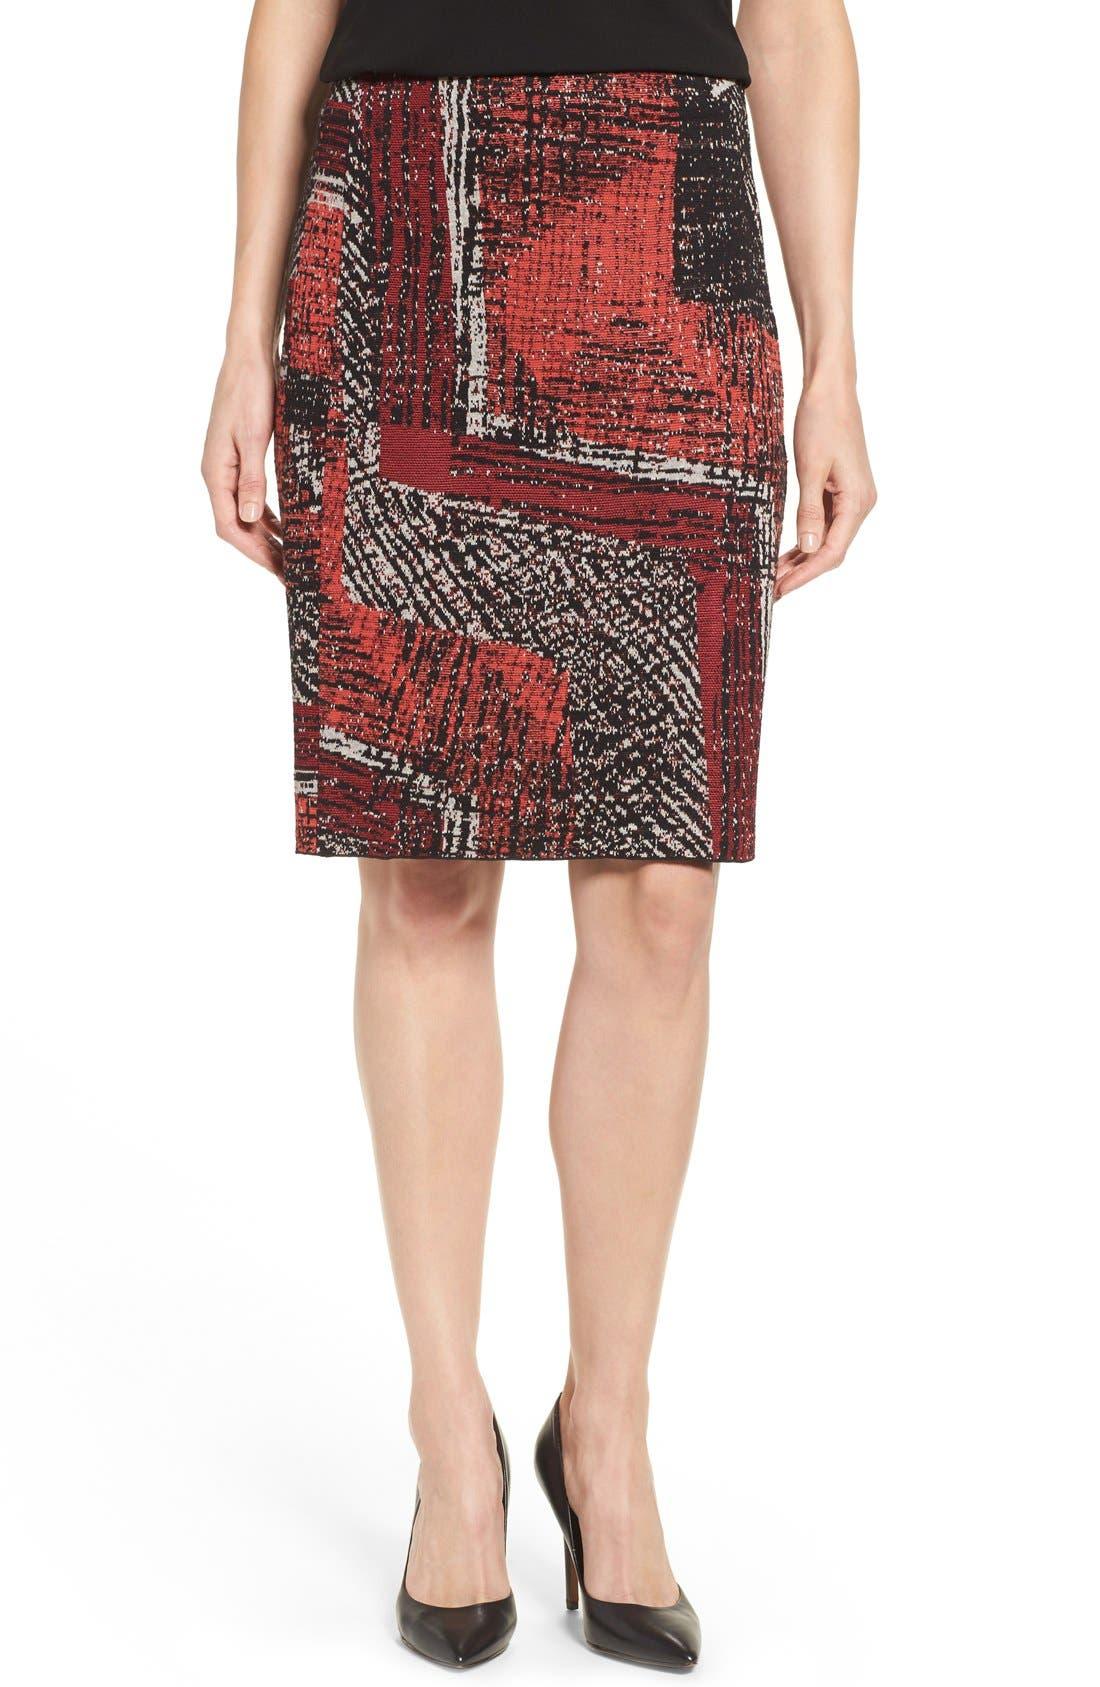 Alternate Image 1 Selected - NIC+ZOE 'Making Marks' Print Knit Pencil Skirt (Regular & Petite)